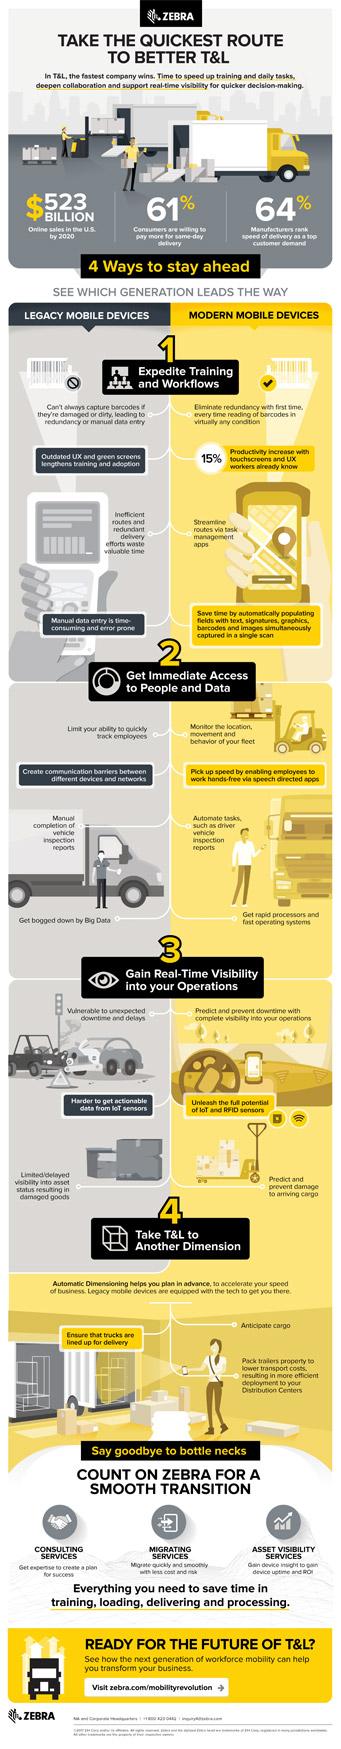 Zebra Infographic Transportation & Logistics